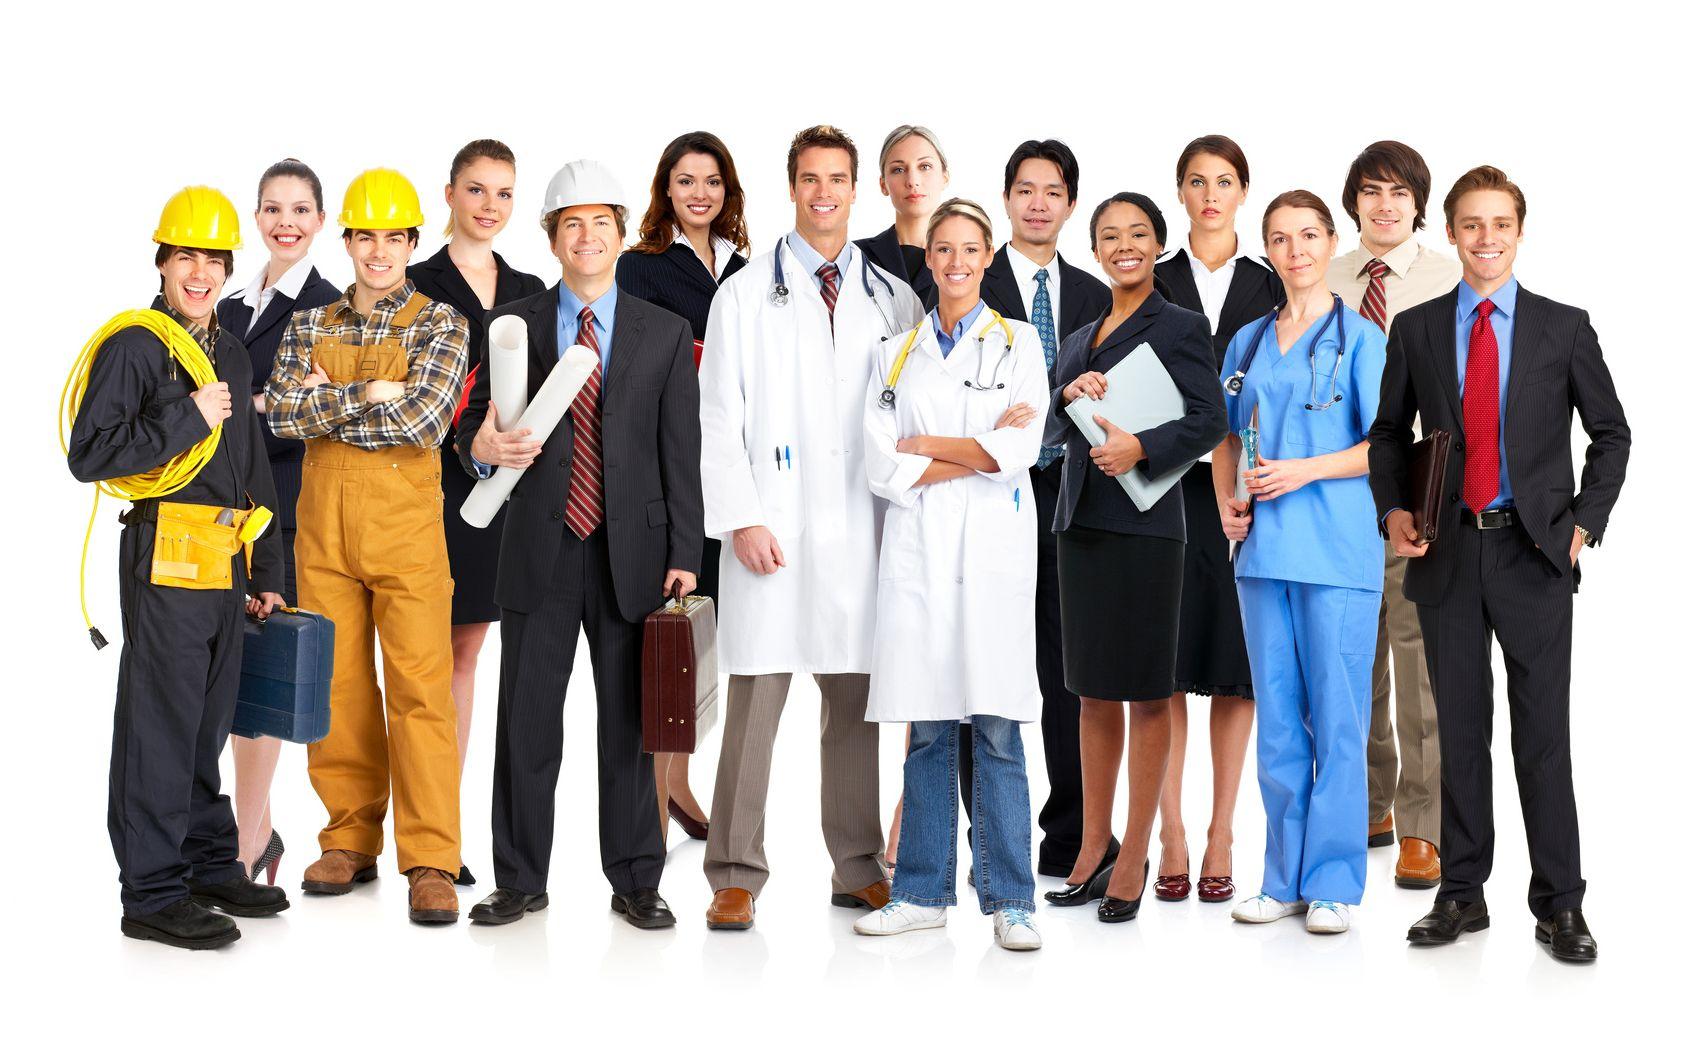 Как найти специалиста редкой профессии?